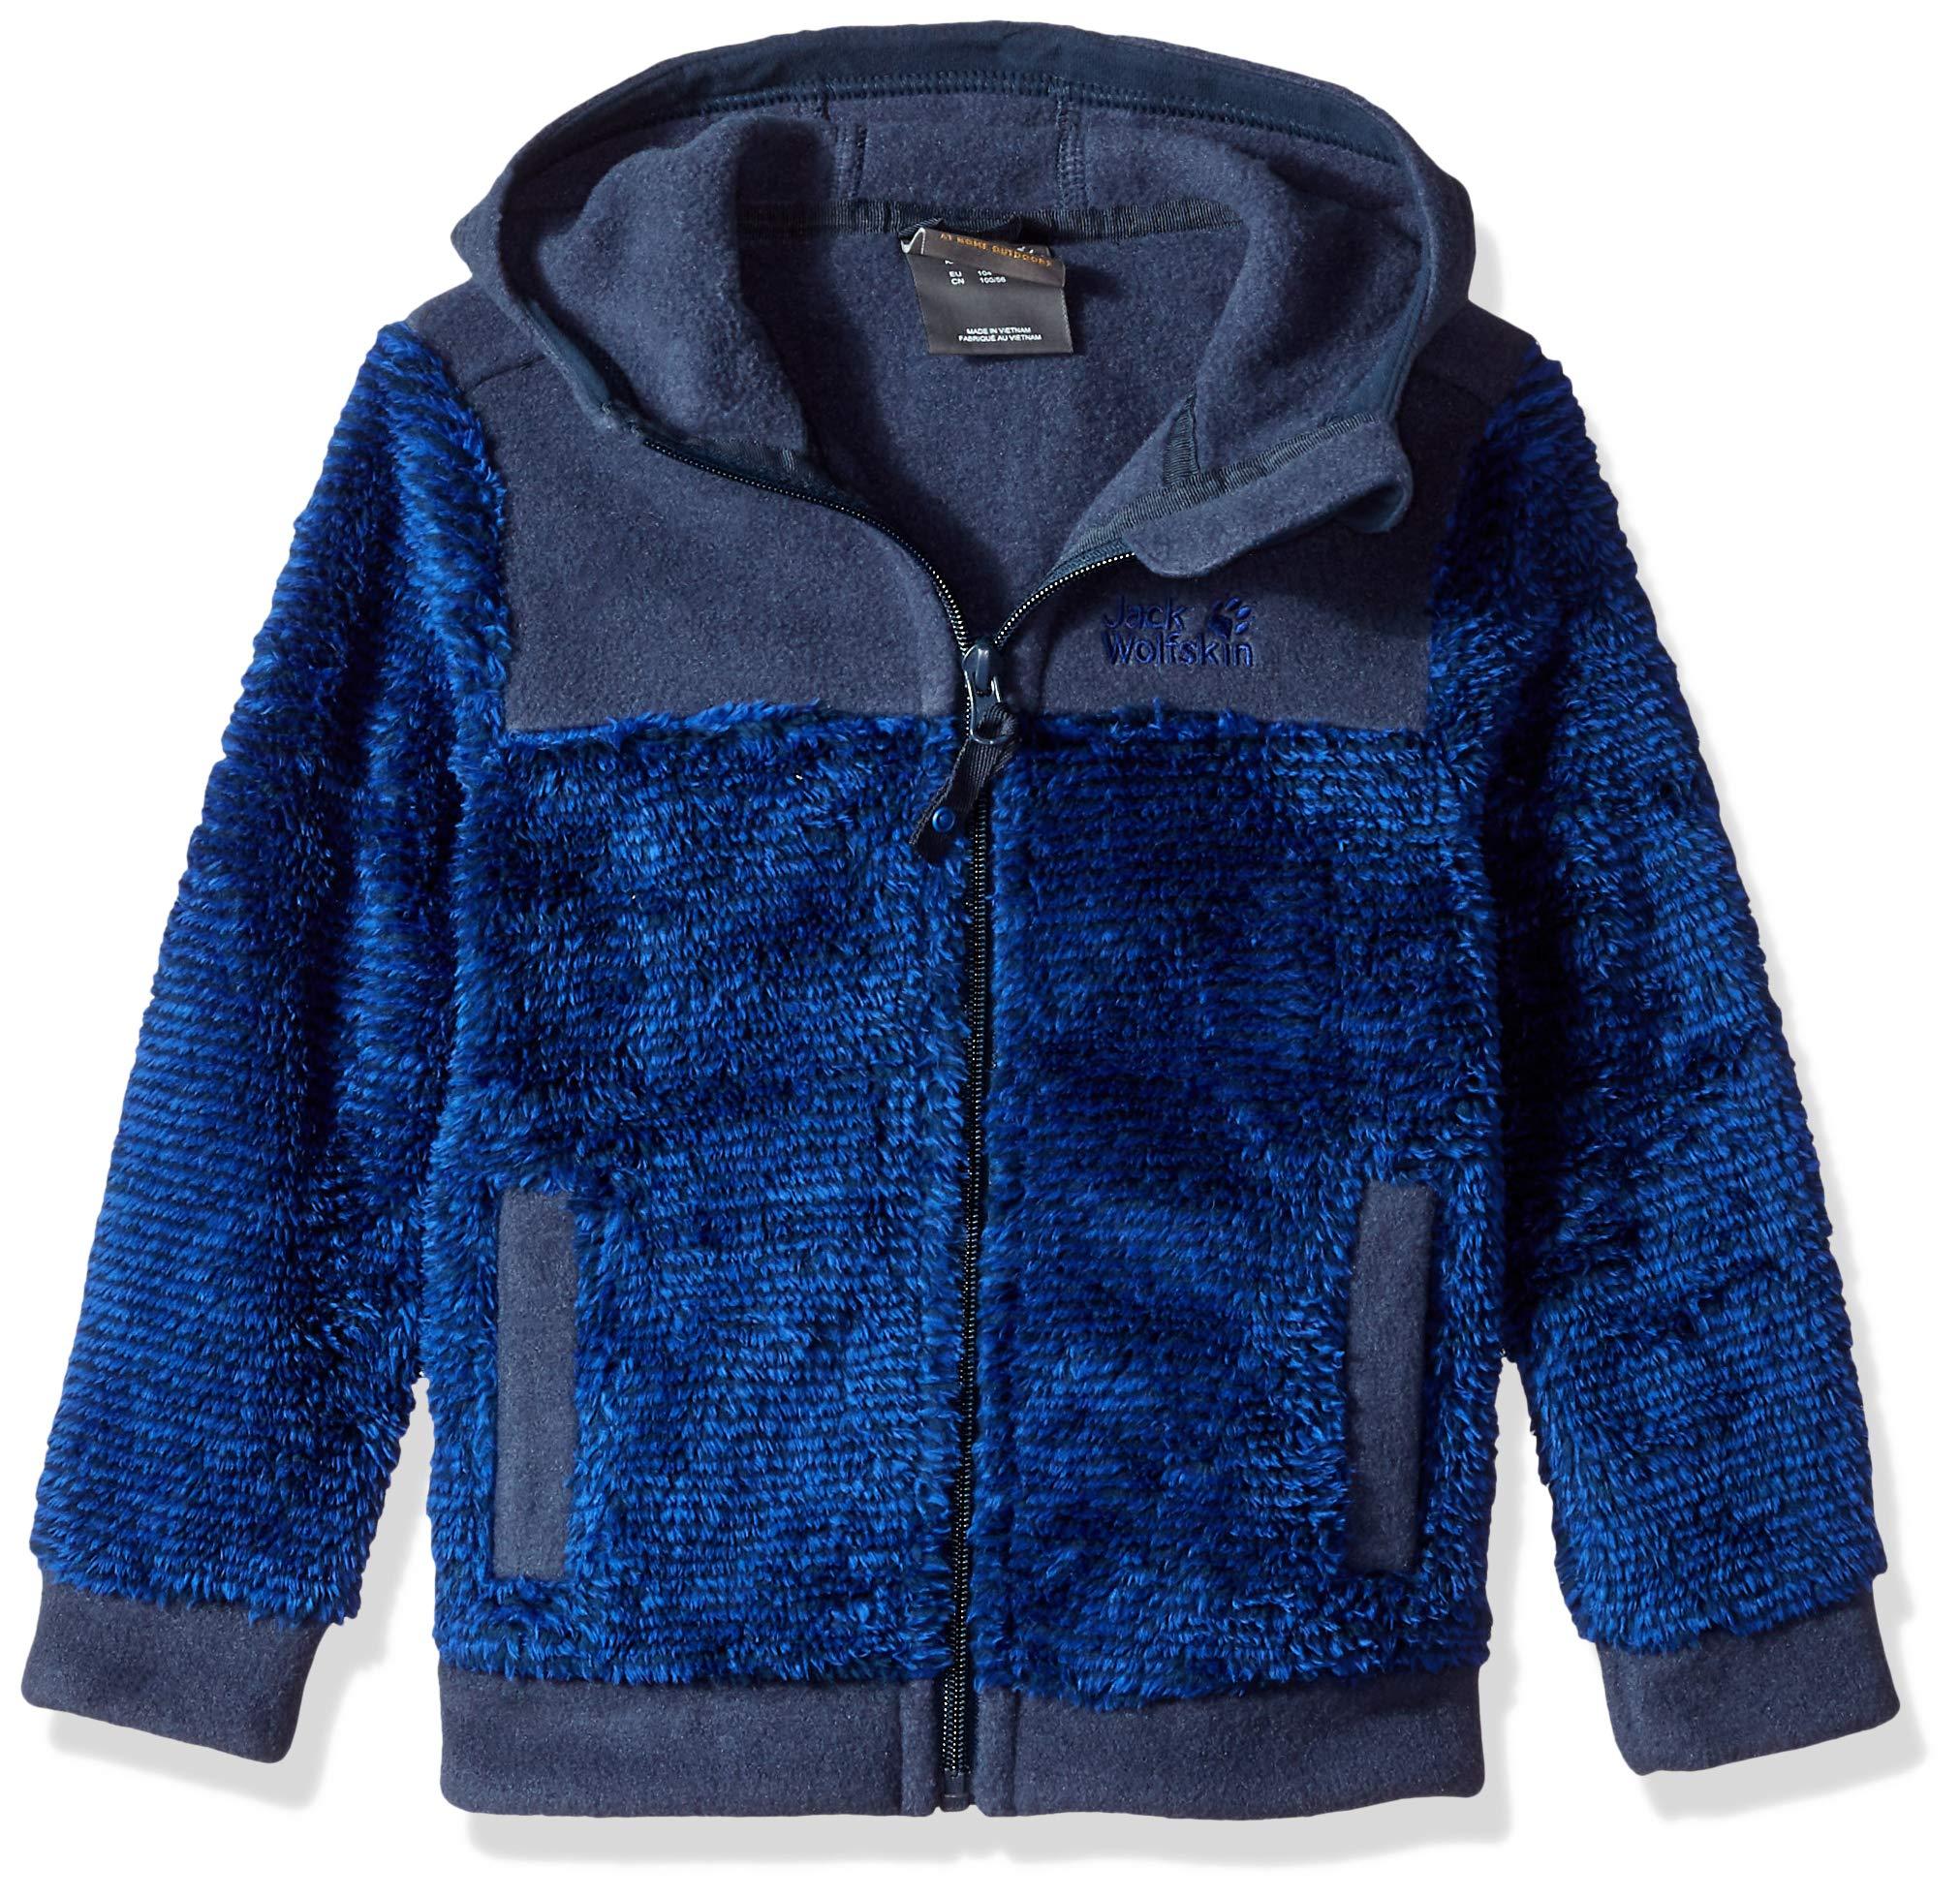 Jack Wolfskin Boy's Pince Cone Jacket, Night Blue Stripes, Size116(5-6)